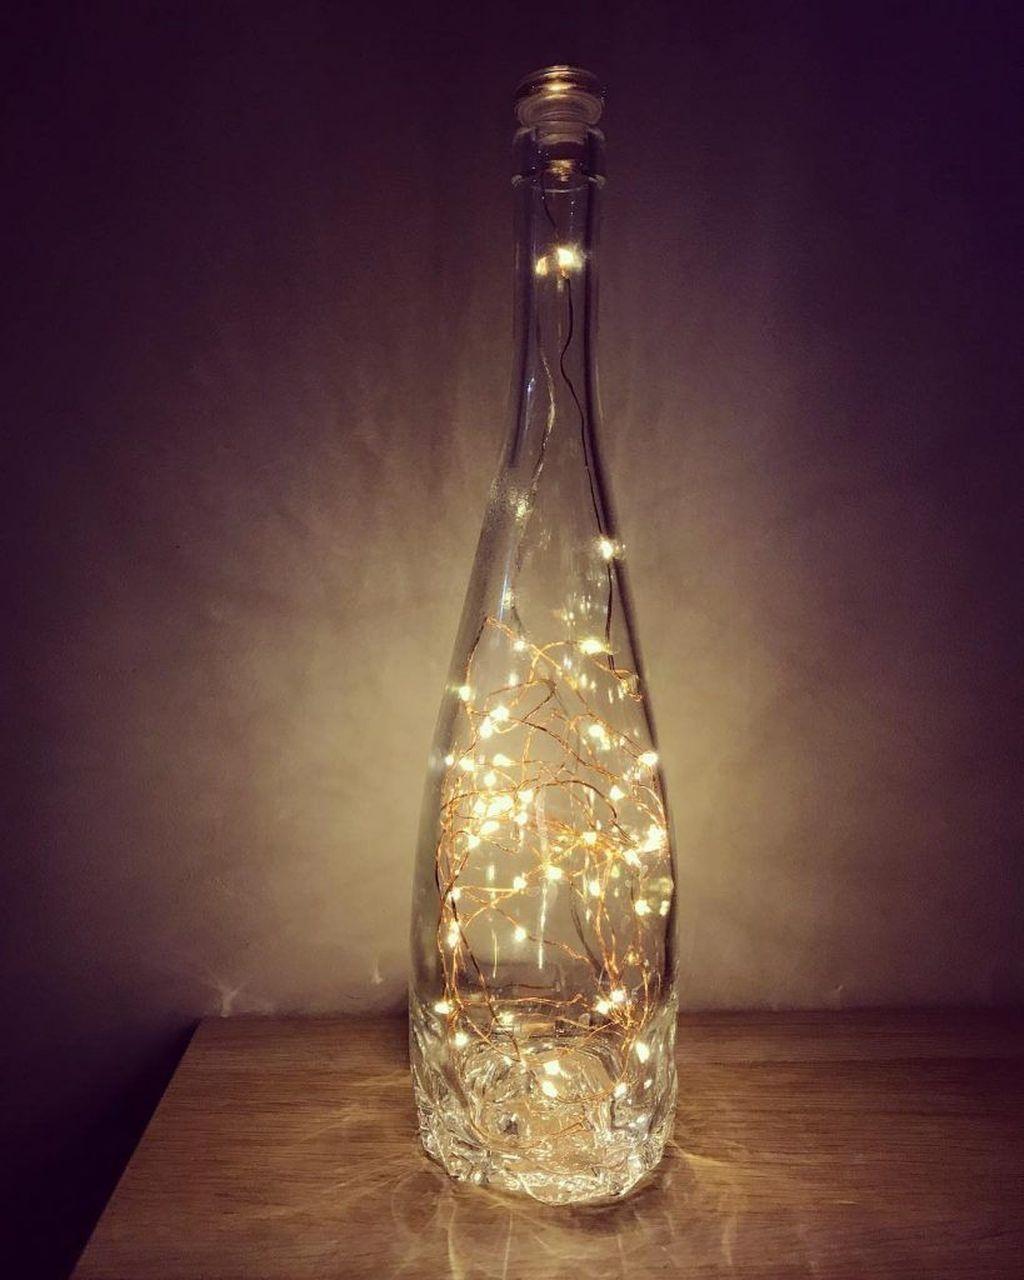 30 Wonderful Diy Bottle Lamp Design Ideas You Must Know Diy Bottle Lamp Wine Bottle Diy Wine Bottle Diy Crafts